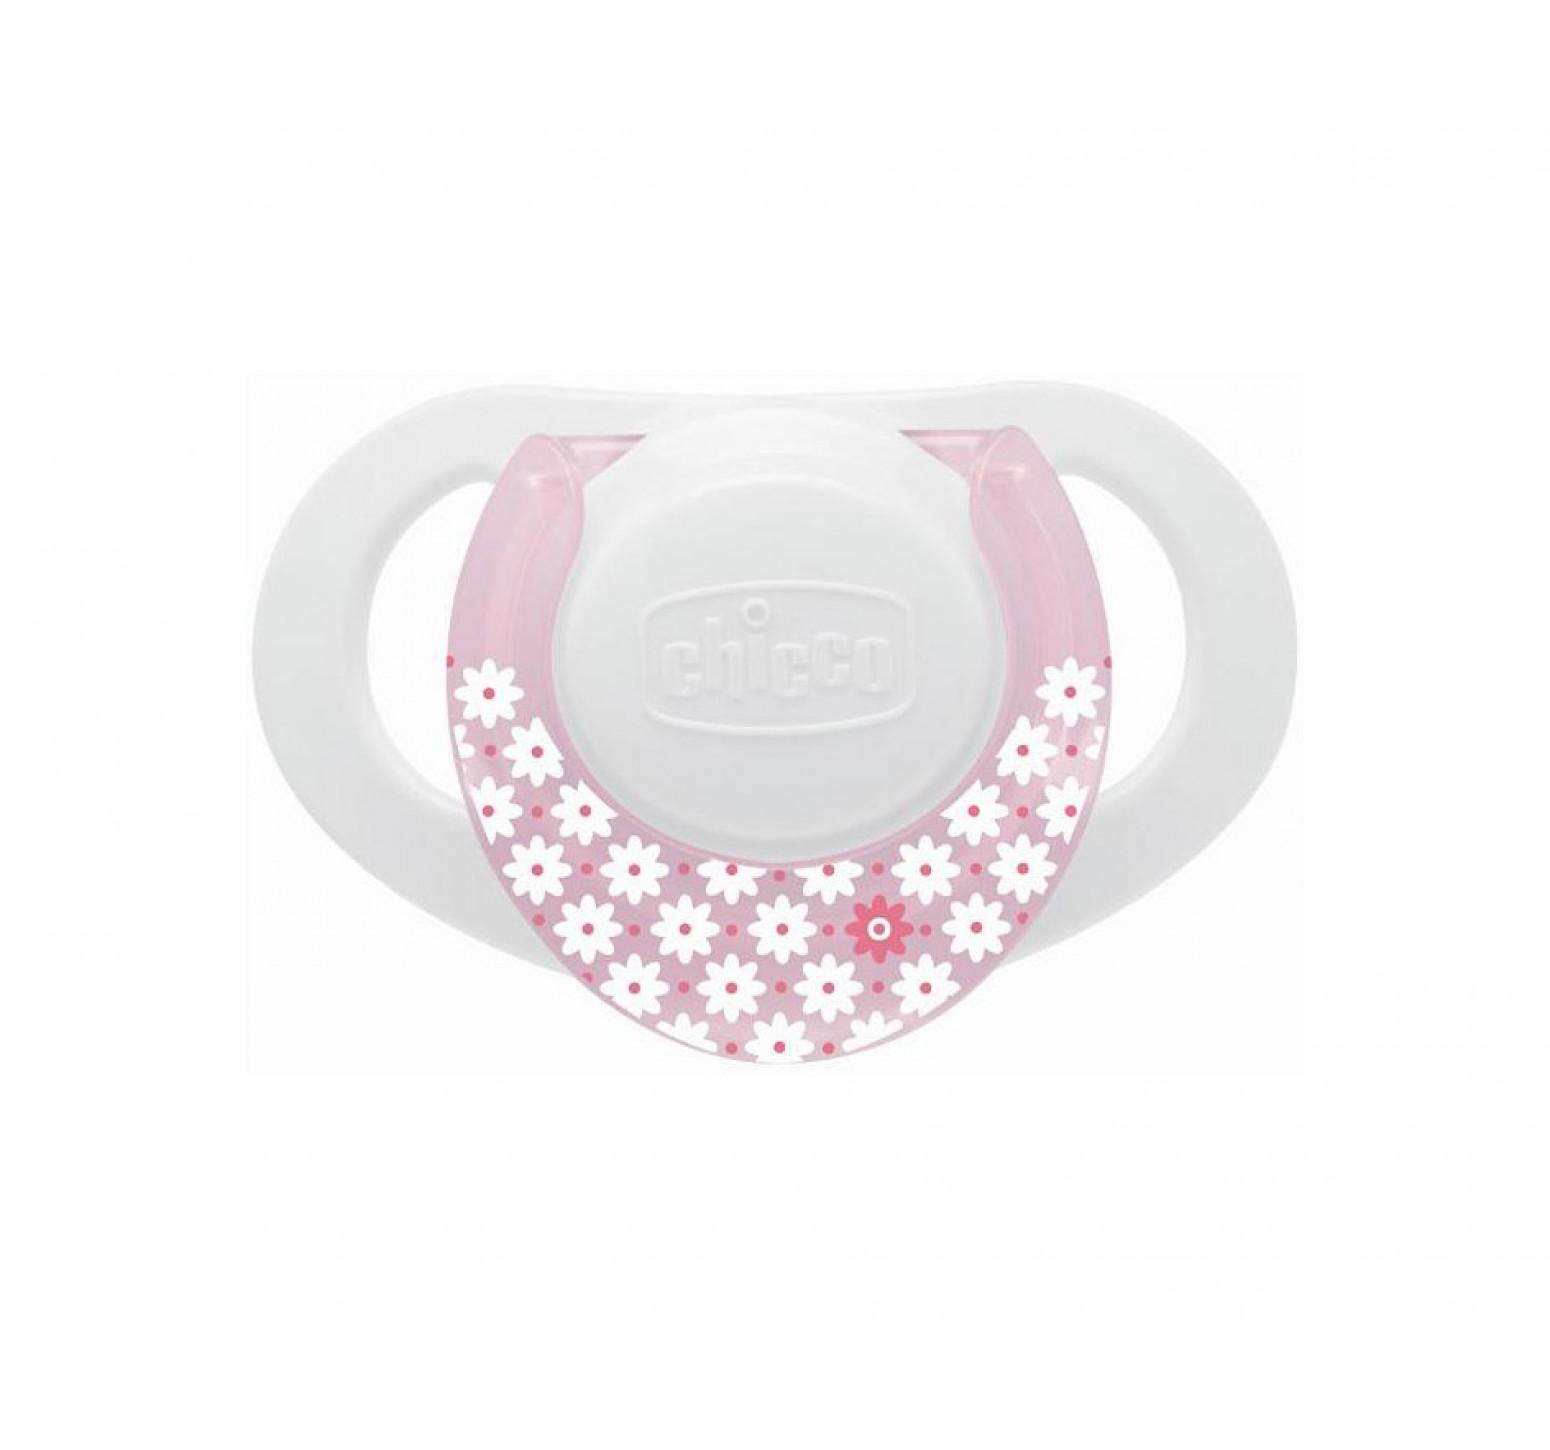 Chicco Chupete Physio Ring 0m+ (blanco con rosa y lila)